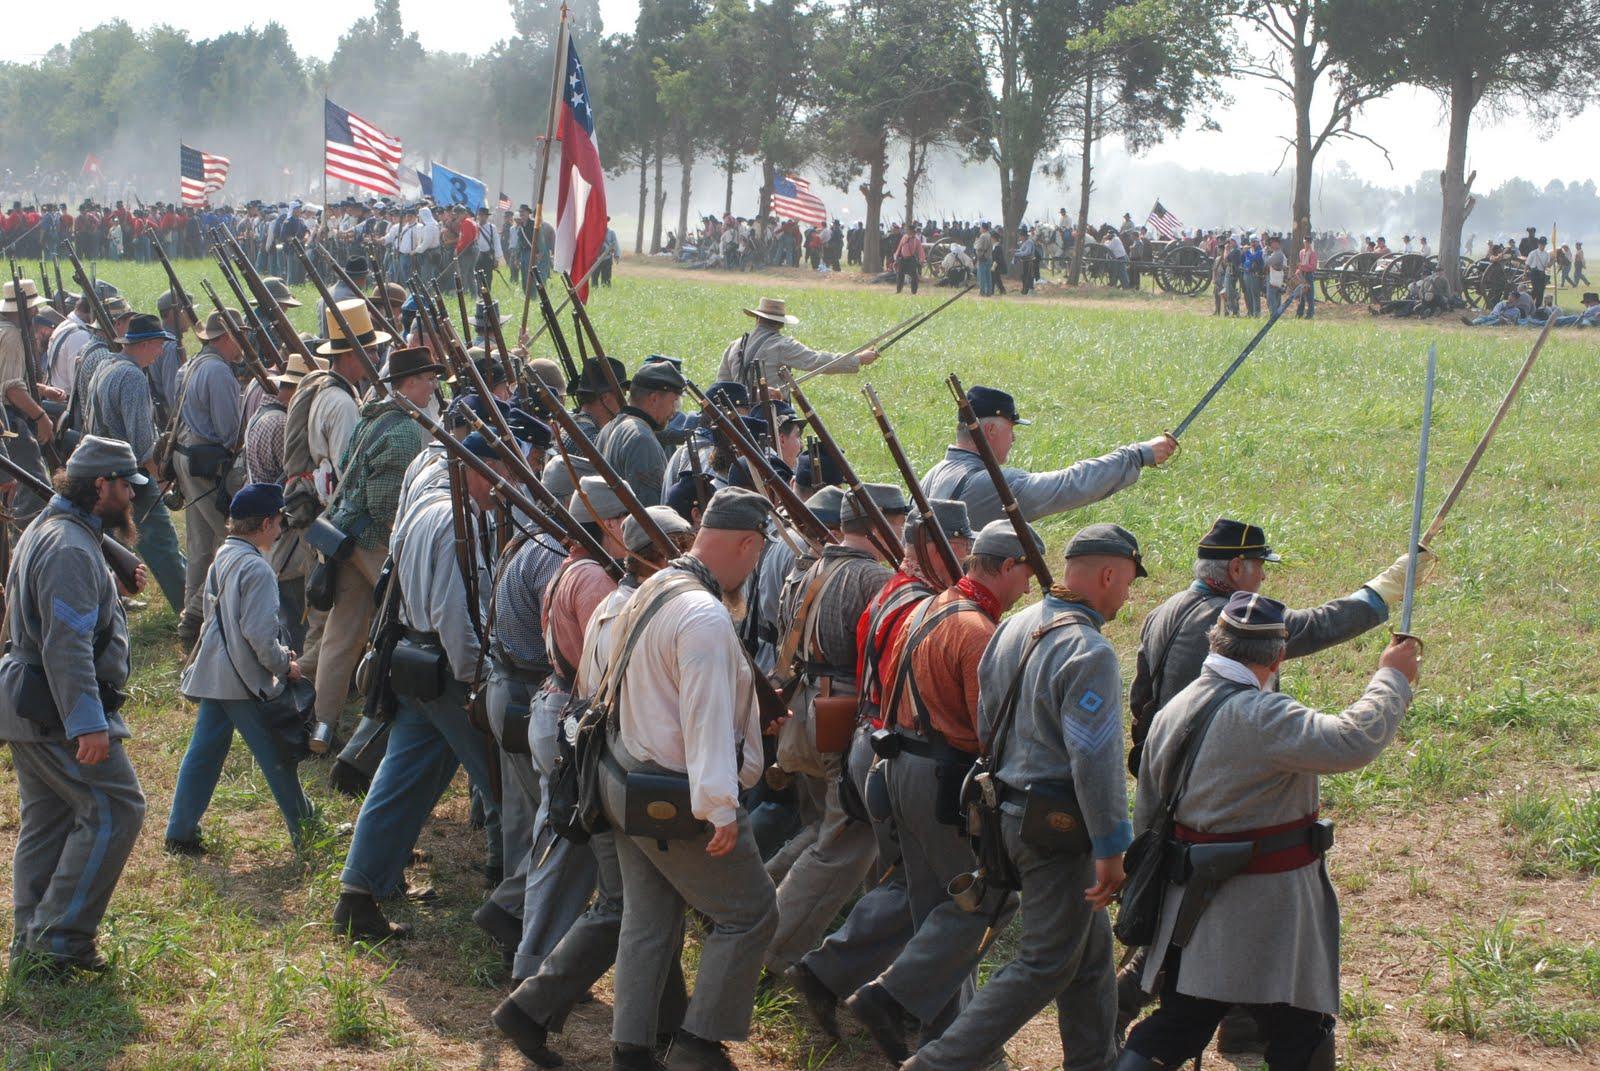 Battle Of Manassas 150th Reenactment Discerning History